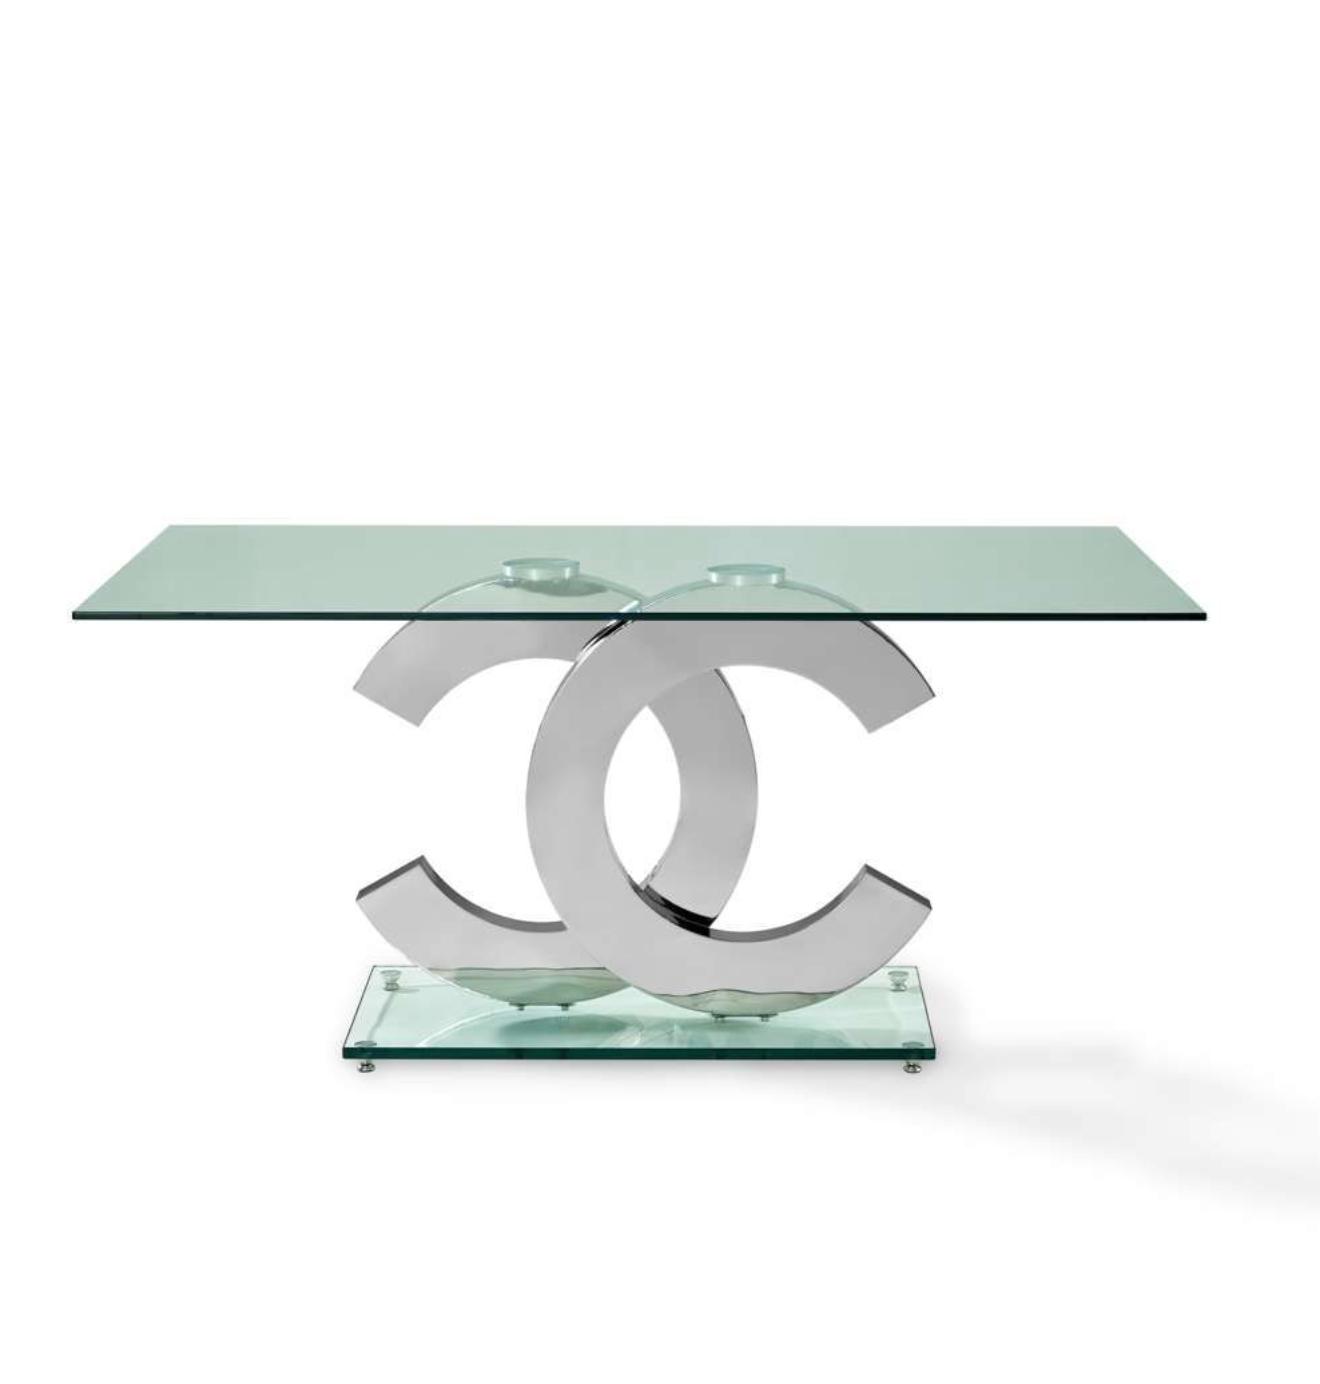 coc tablecreative, creative furniture usa, creative dining